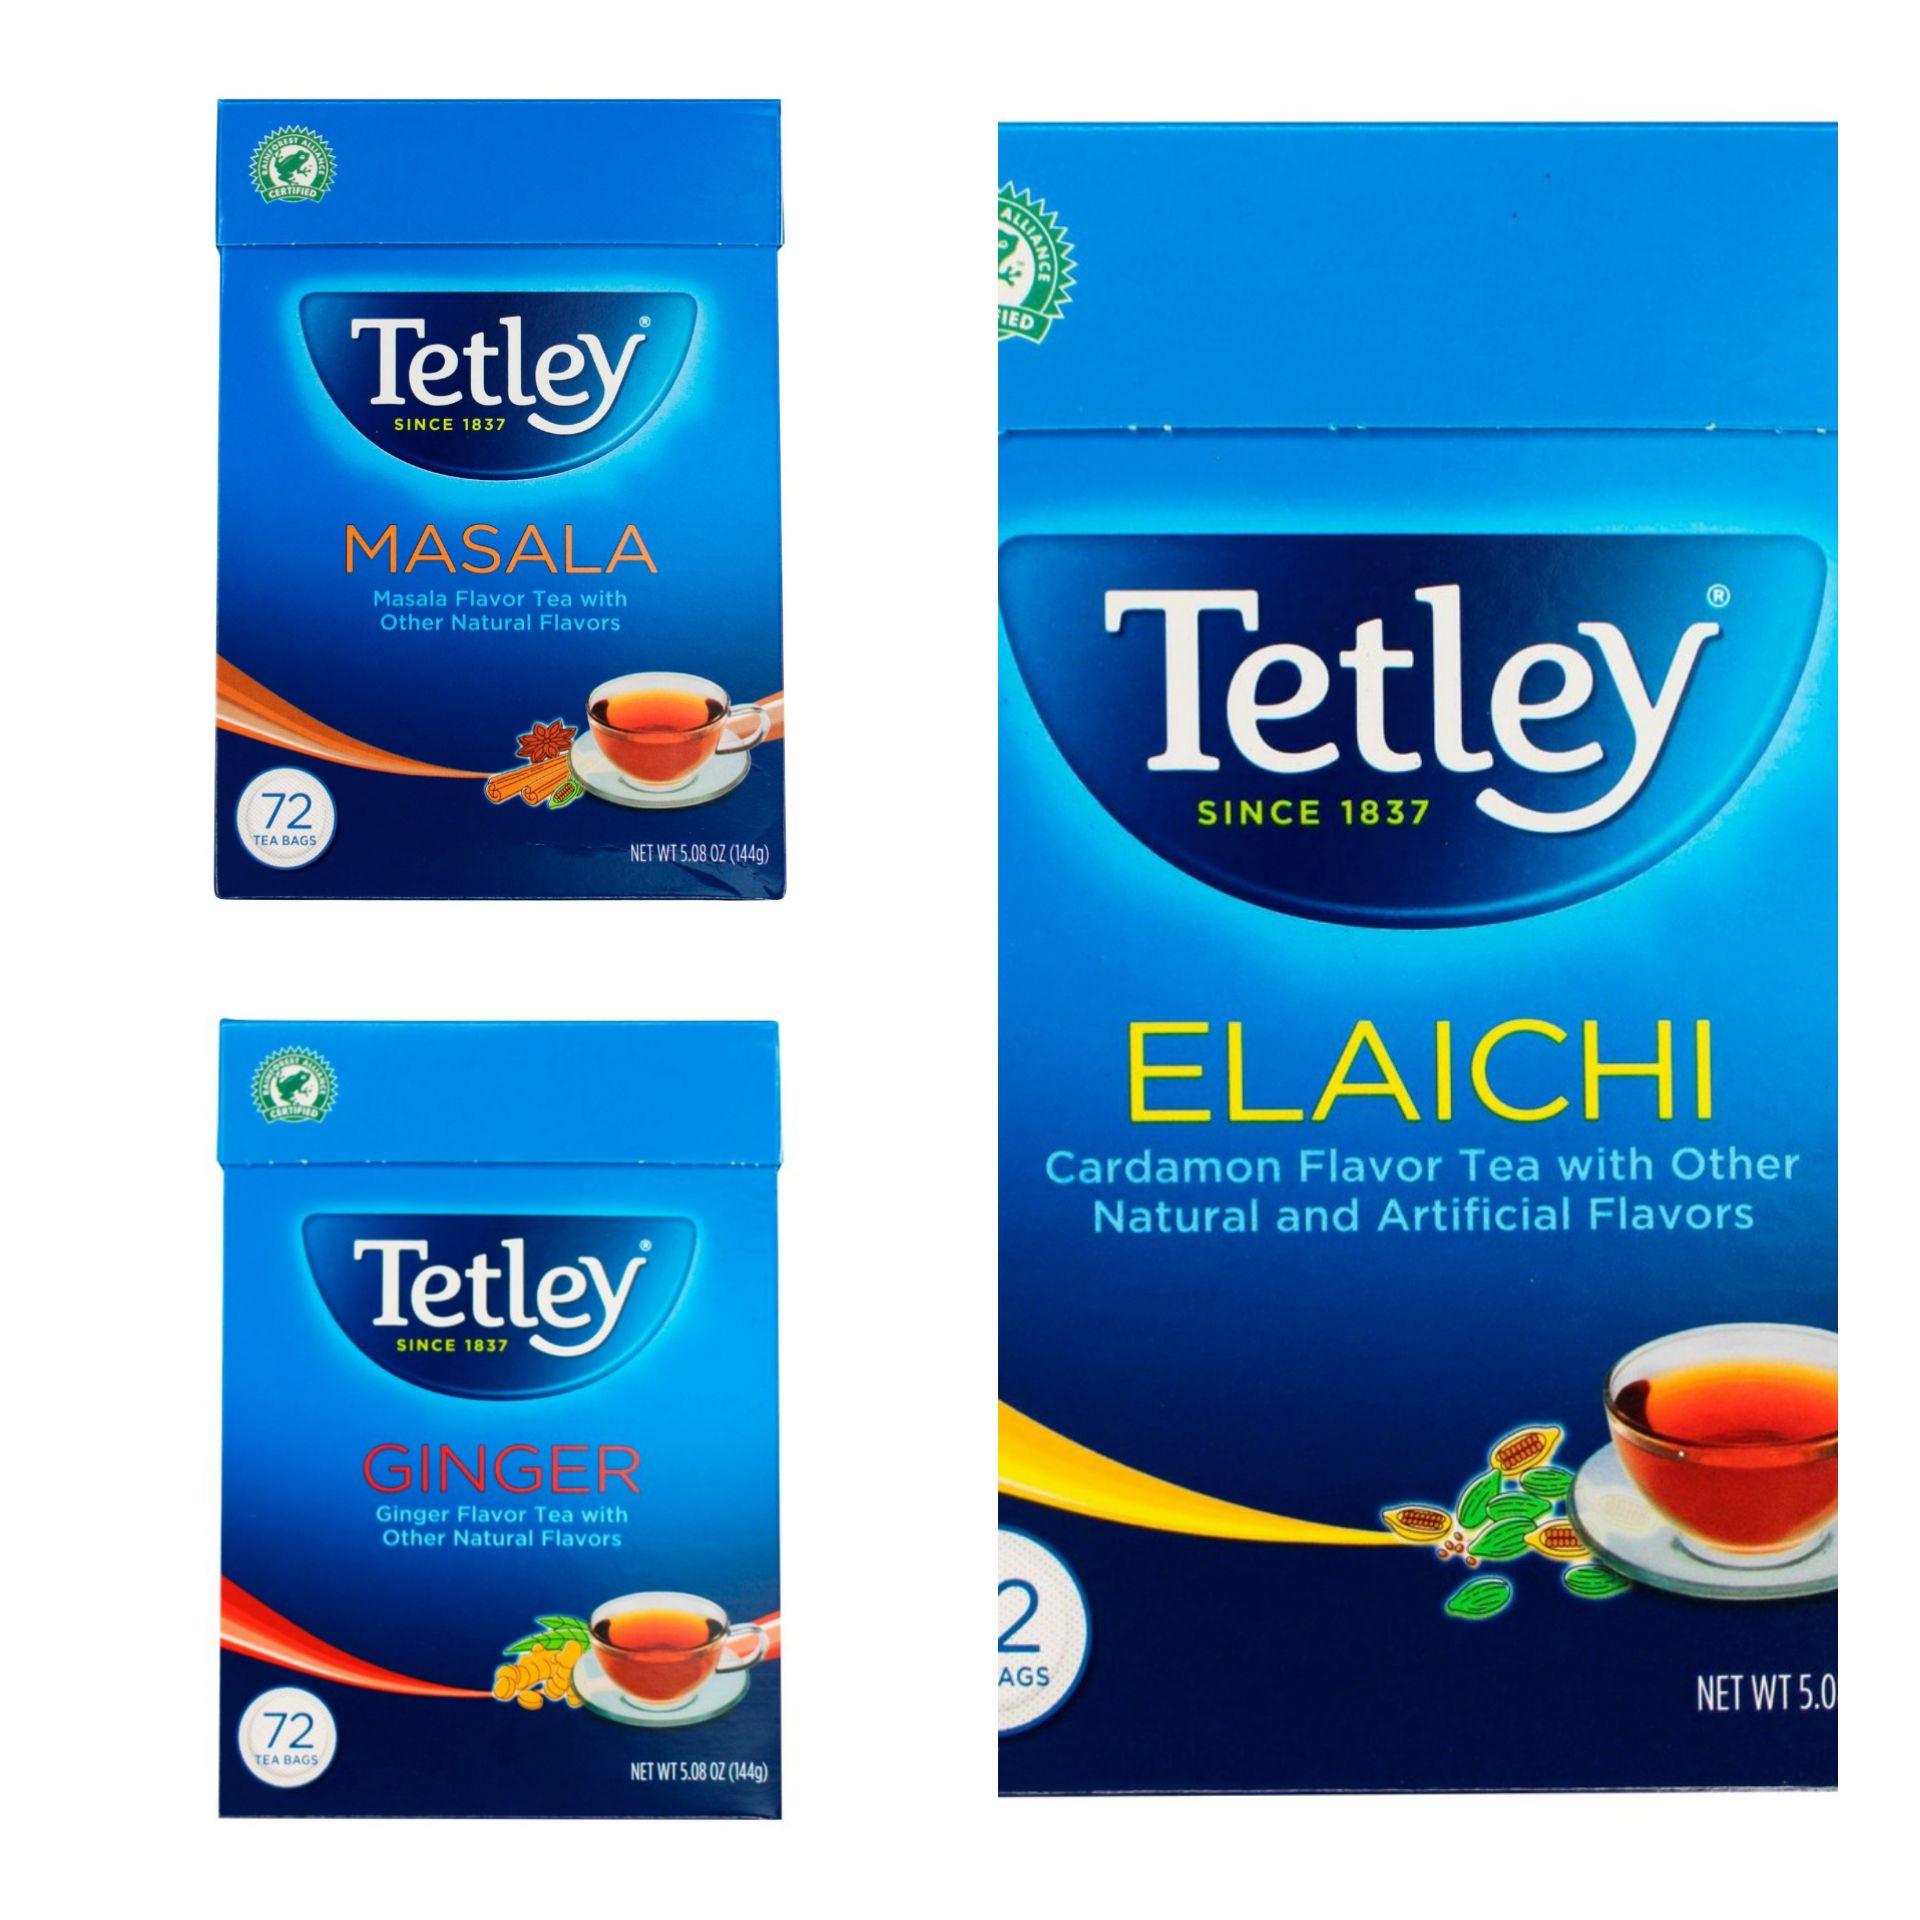 Tetley Masala / elaichi / ginger 72 Tea Bags144g - £1.50 (Minimum Basket / Delivery Fee Applies) @ Morrisons